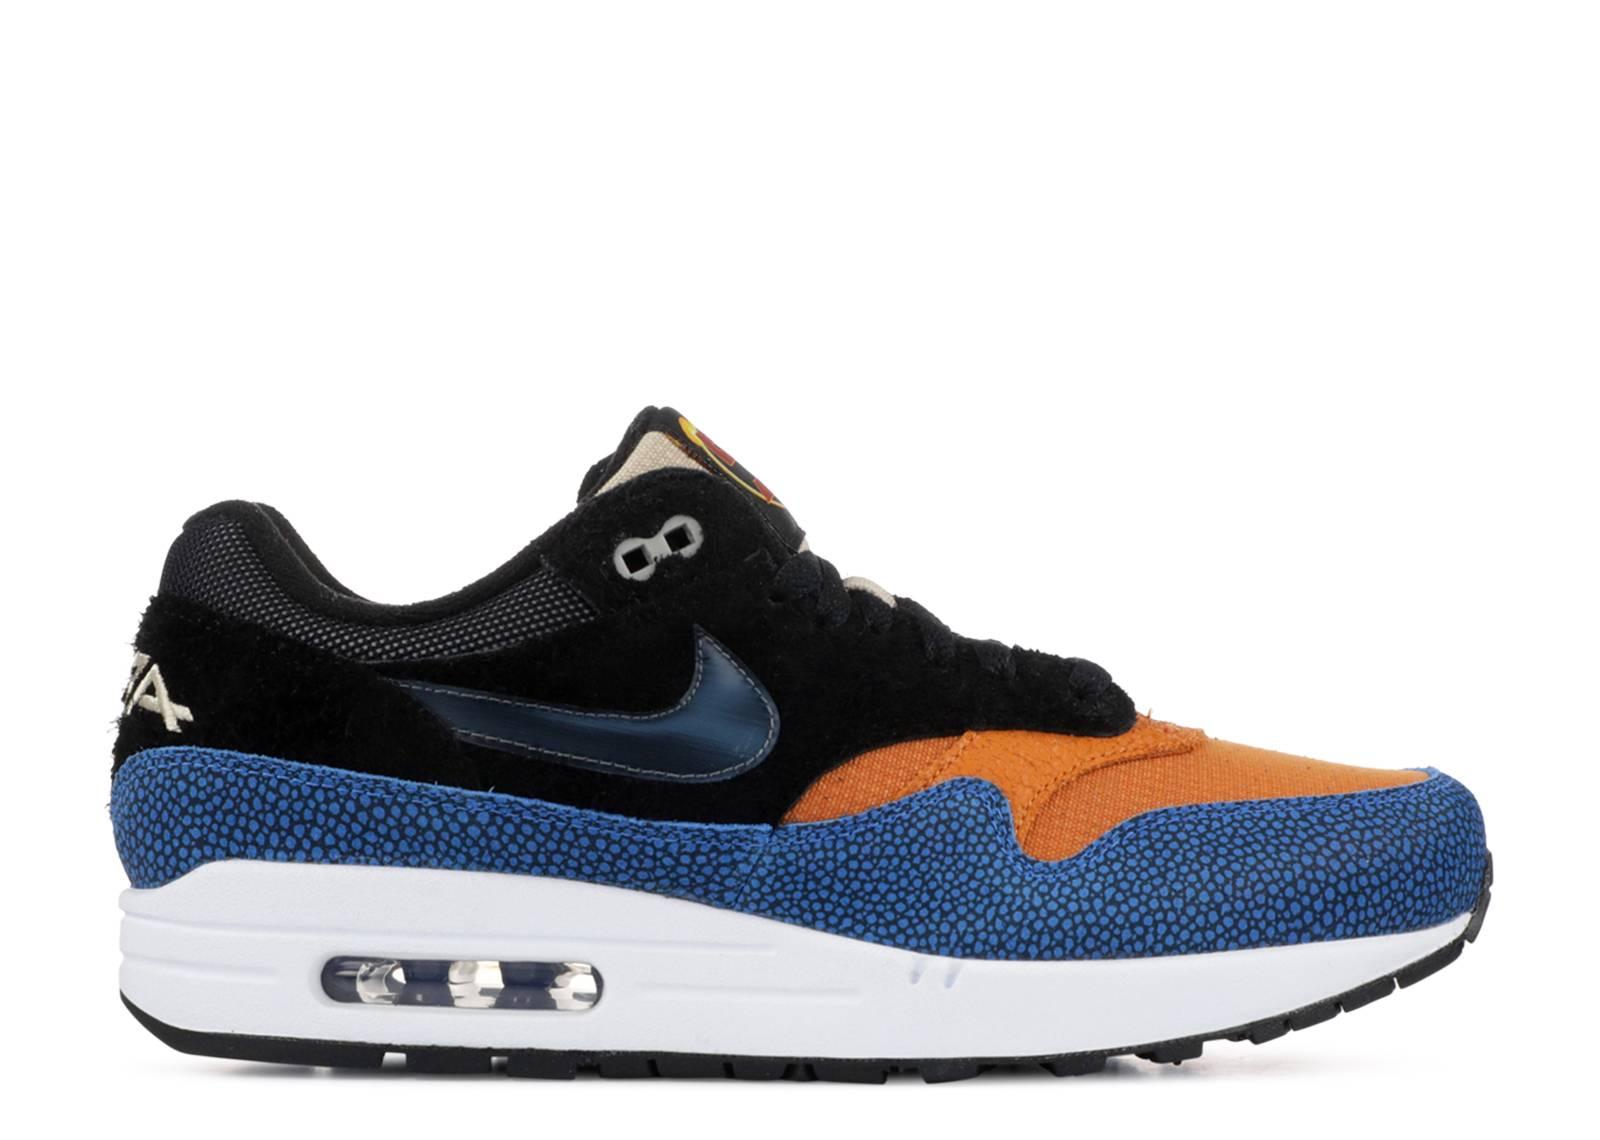 Nike Air Max 1 Men's & Women's Shoes | Flight Club